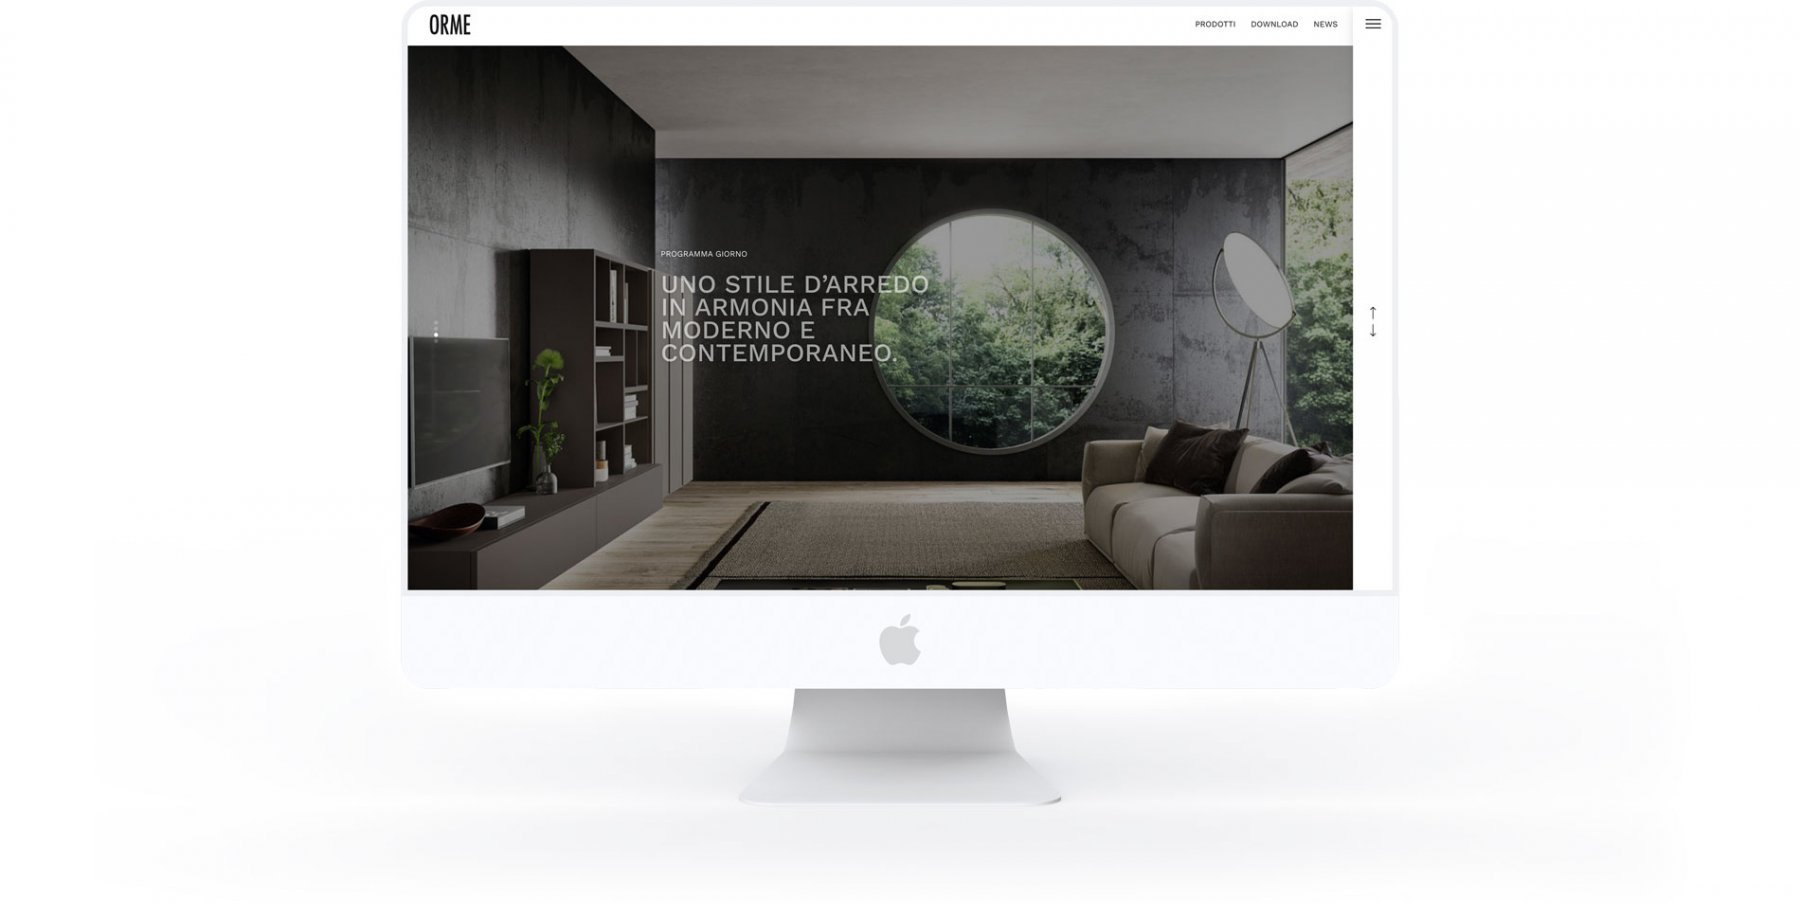 homes-orme-website